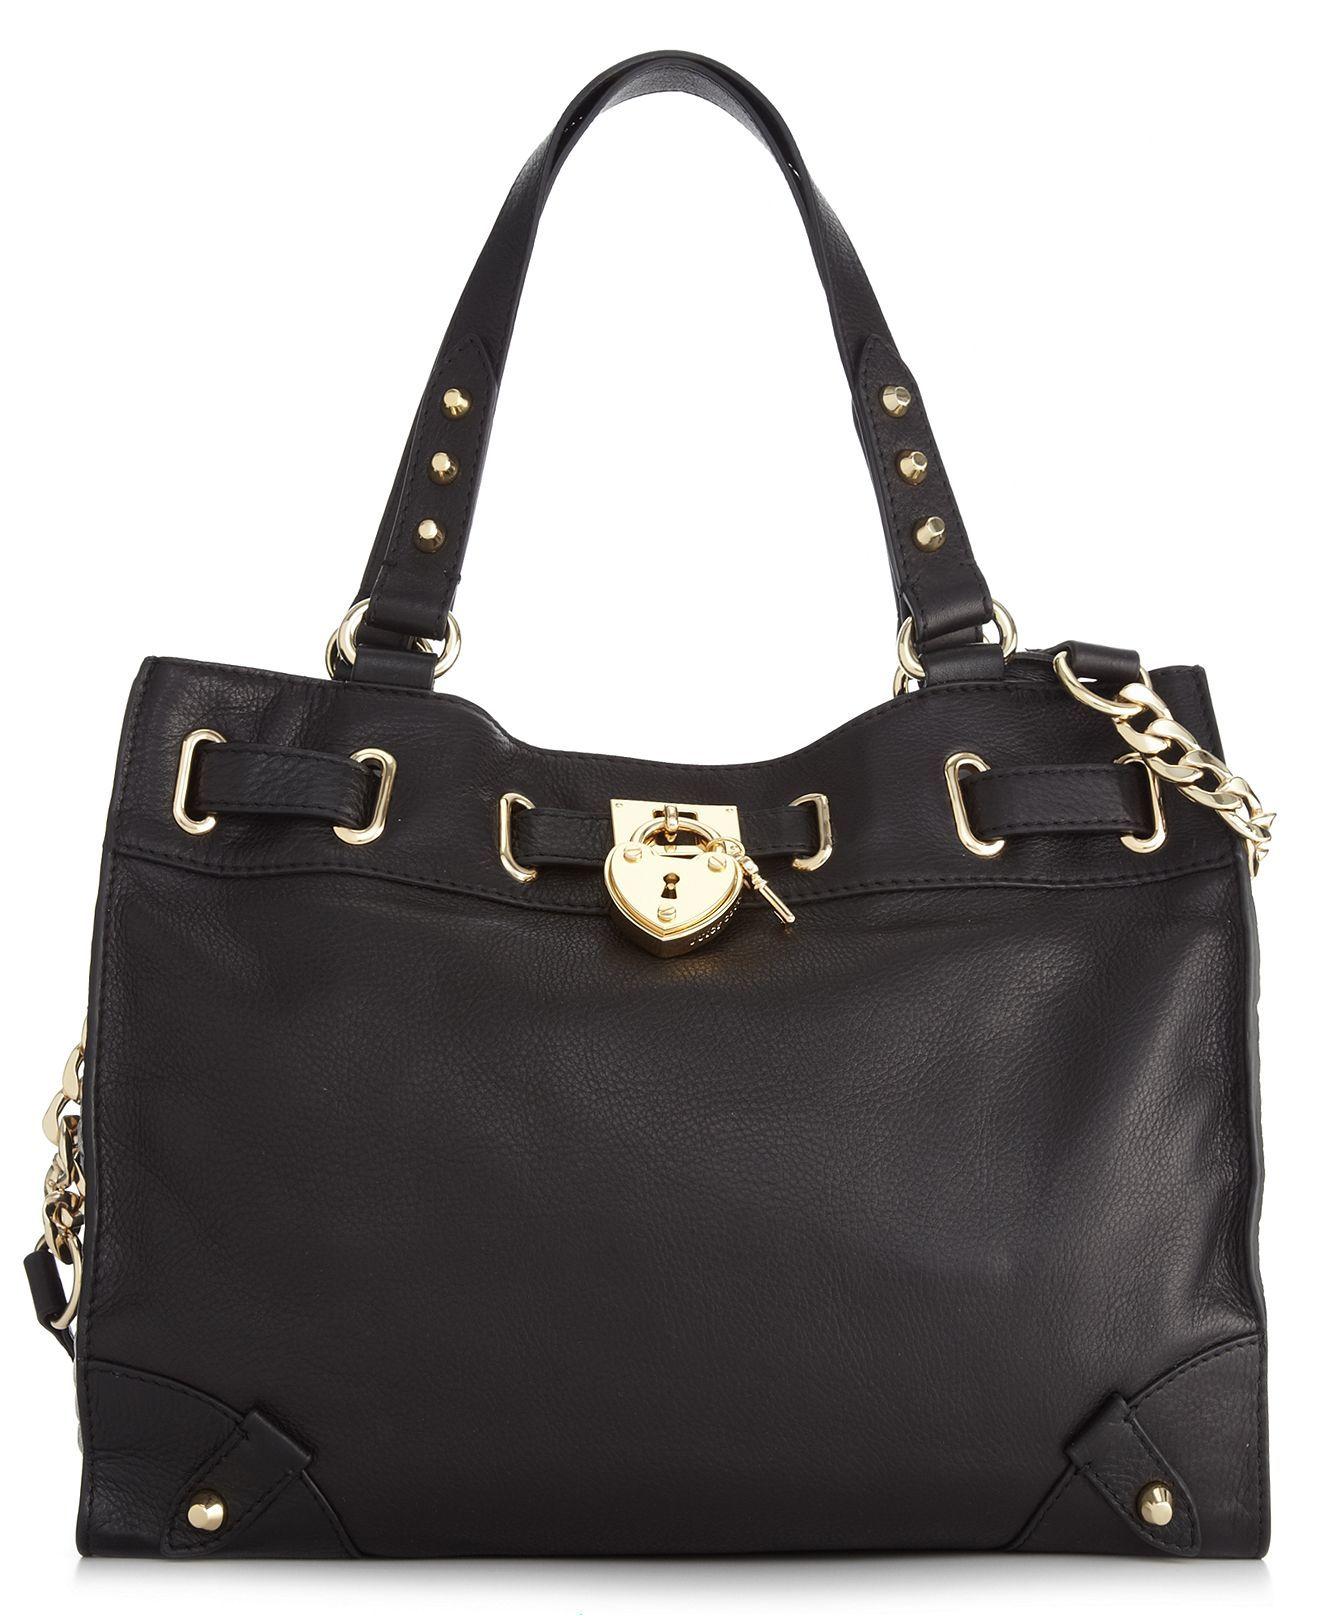 Juicy Couture. Juicy Couture Leather Satchel Handbags ... 51ac74dec